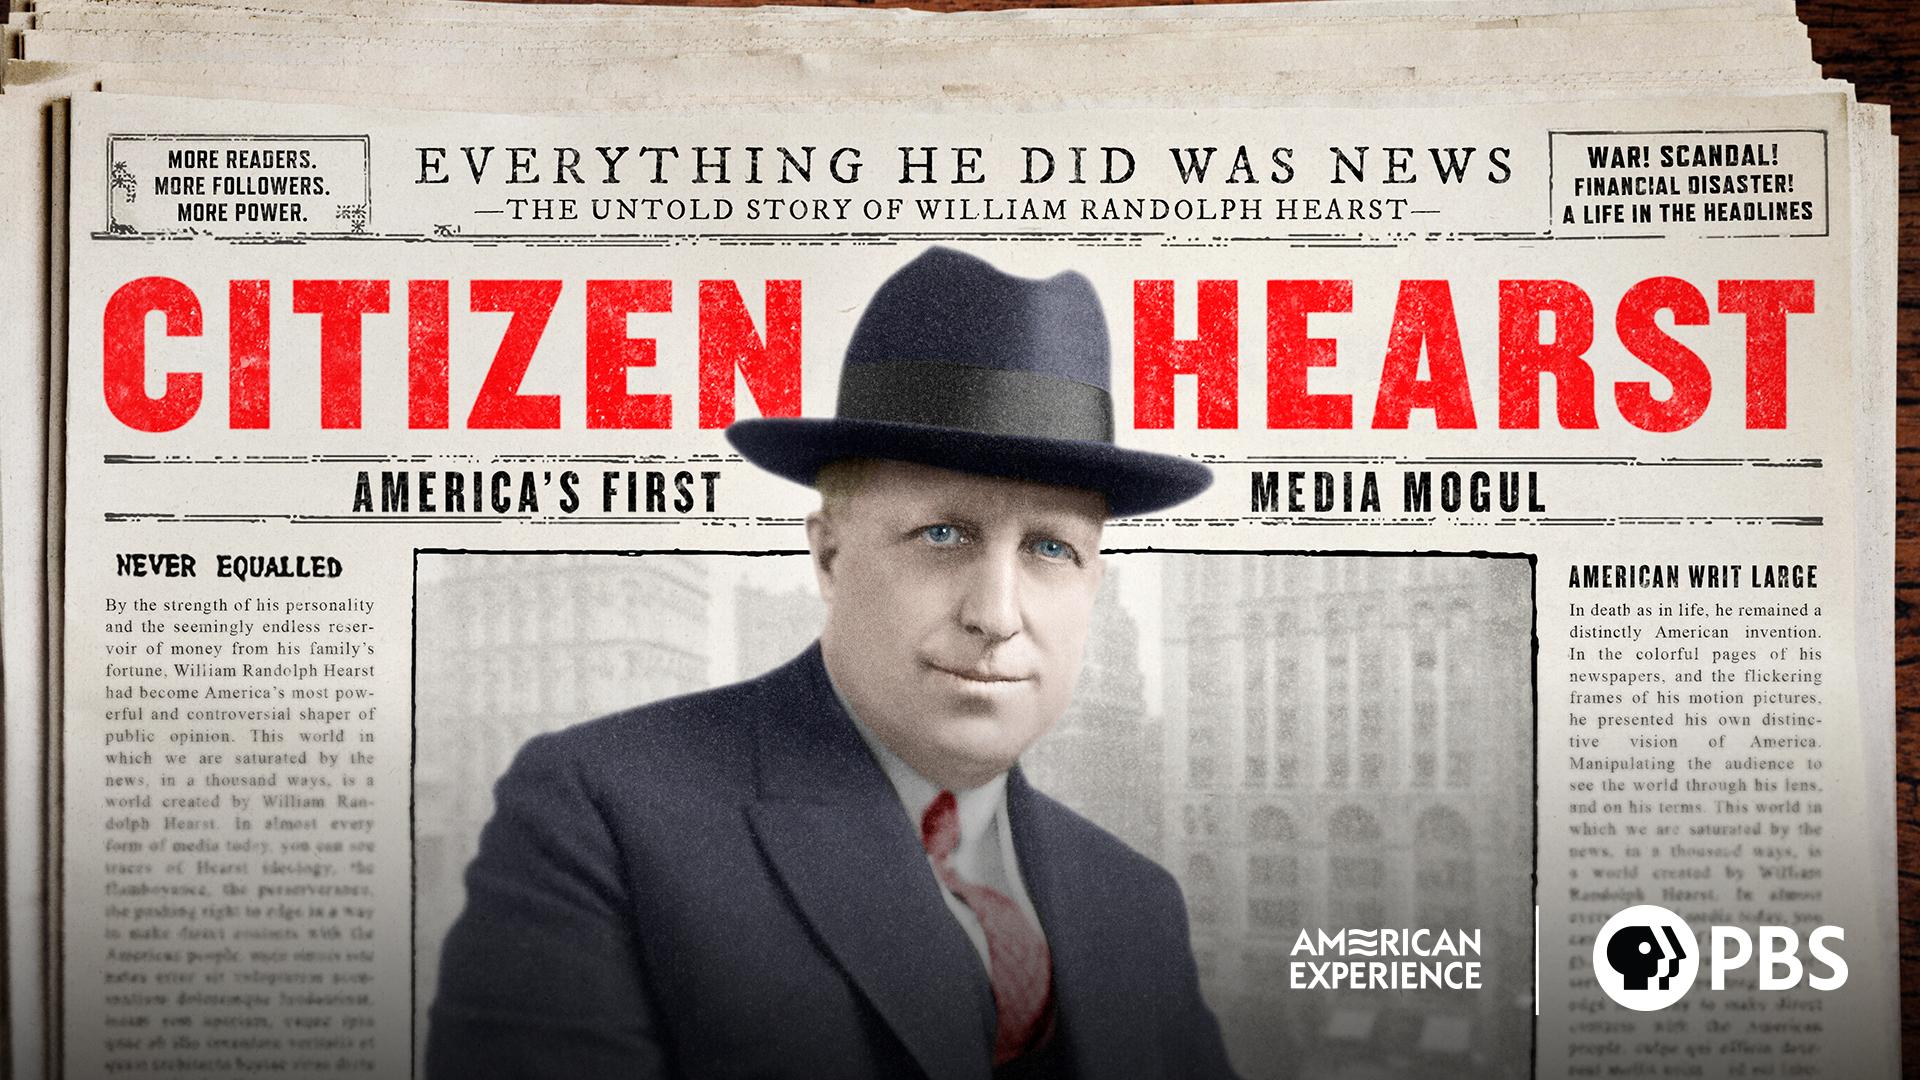 Citizen Hearst, Season 1